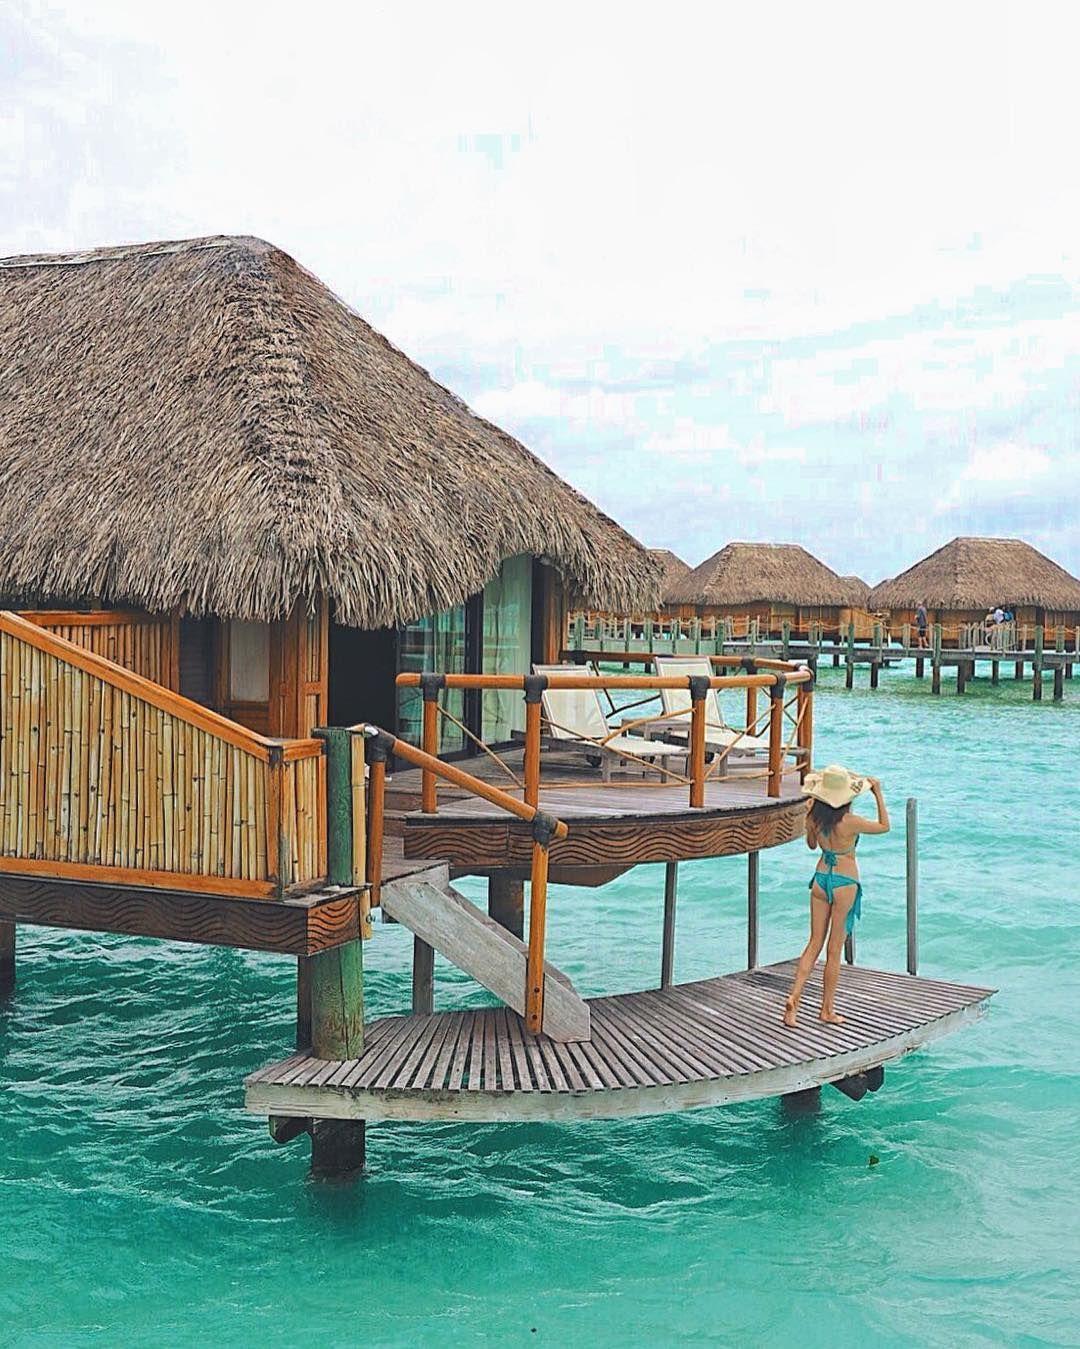 Tahiti - Bucket List Destination. World of Wanderlust Instagram